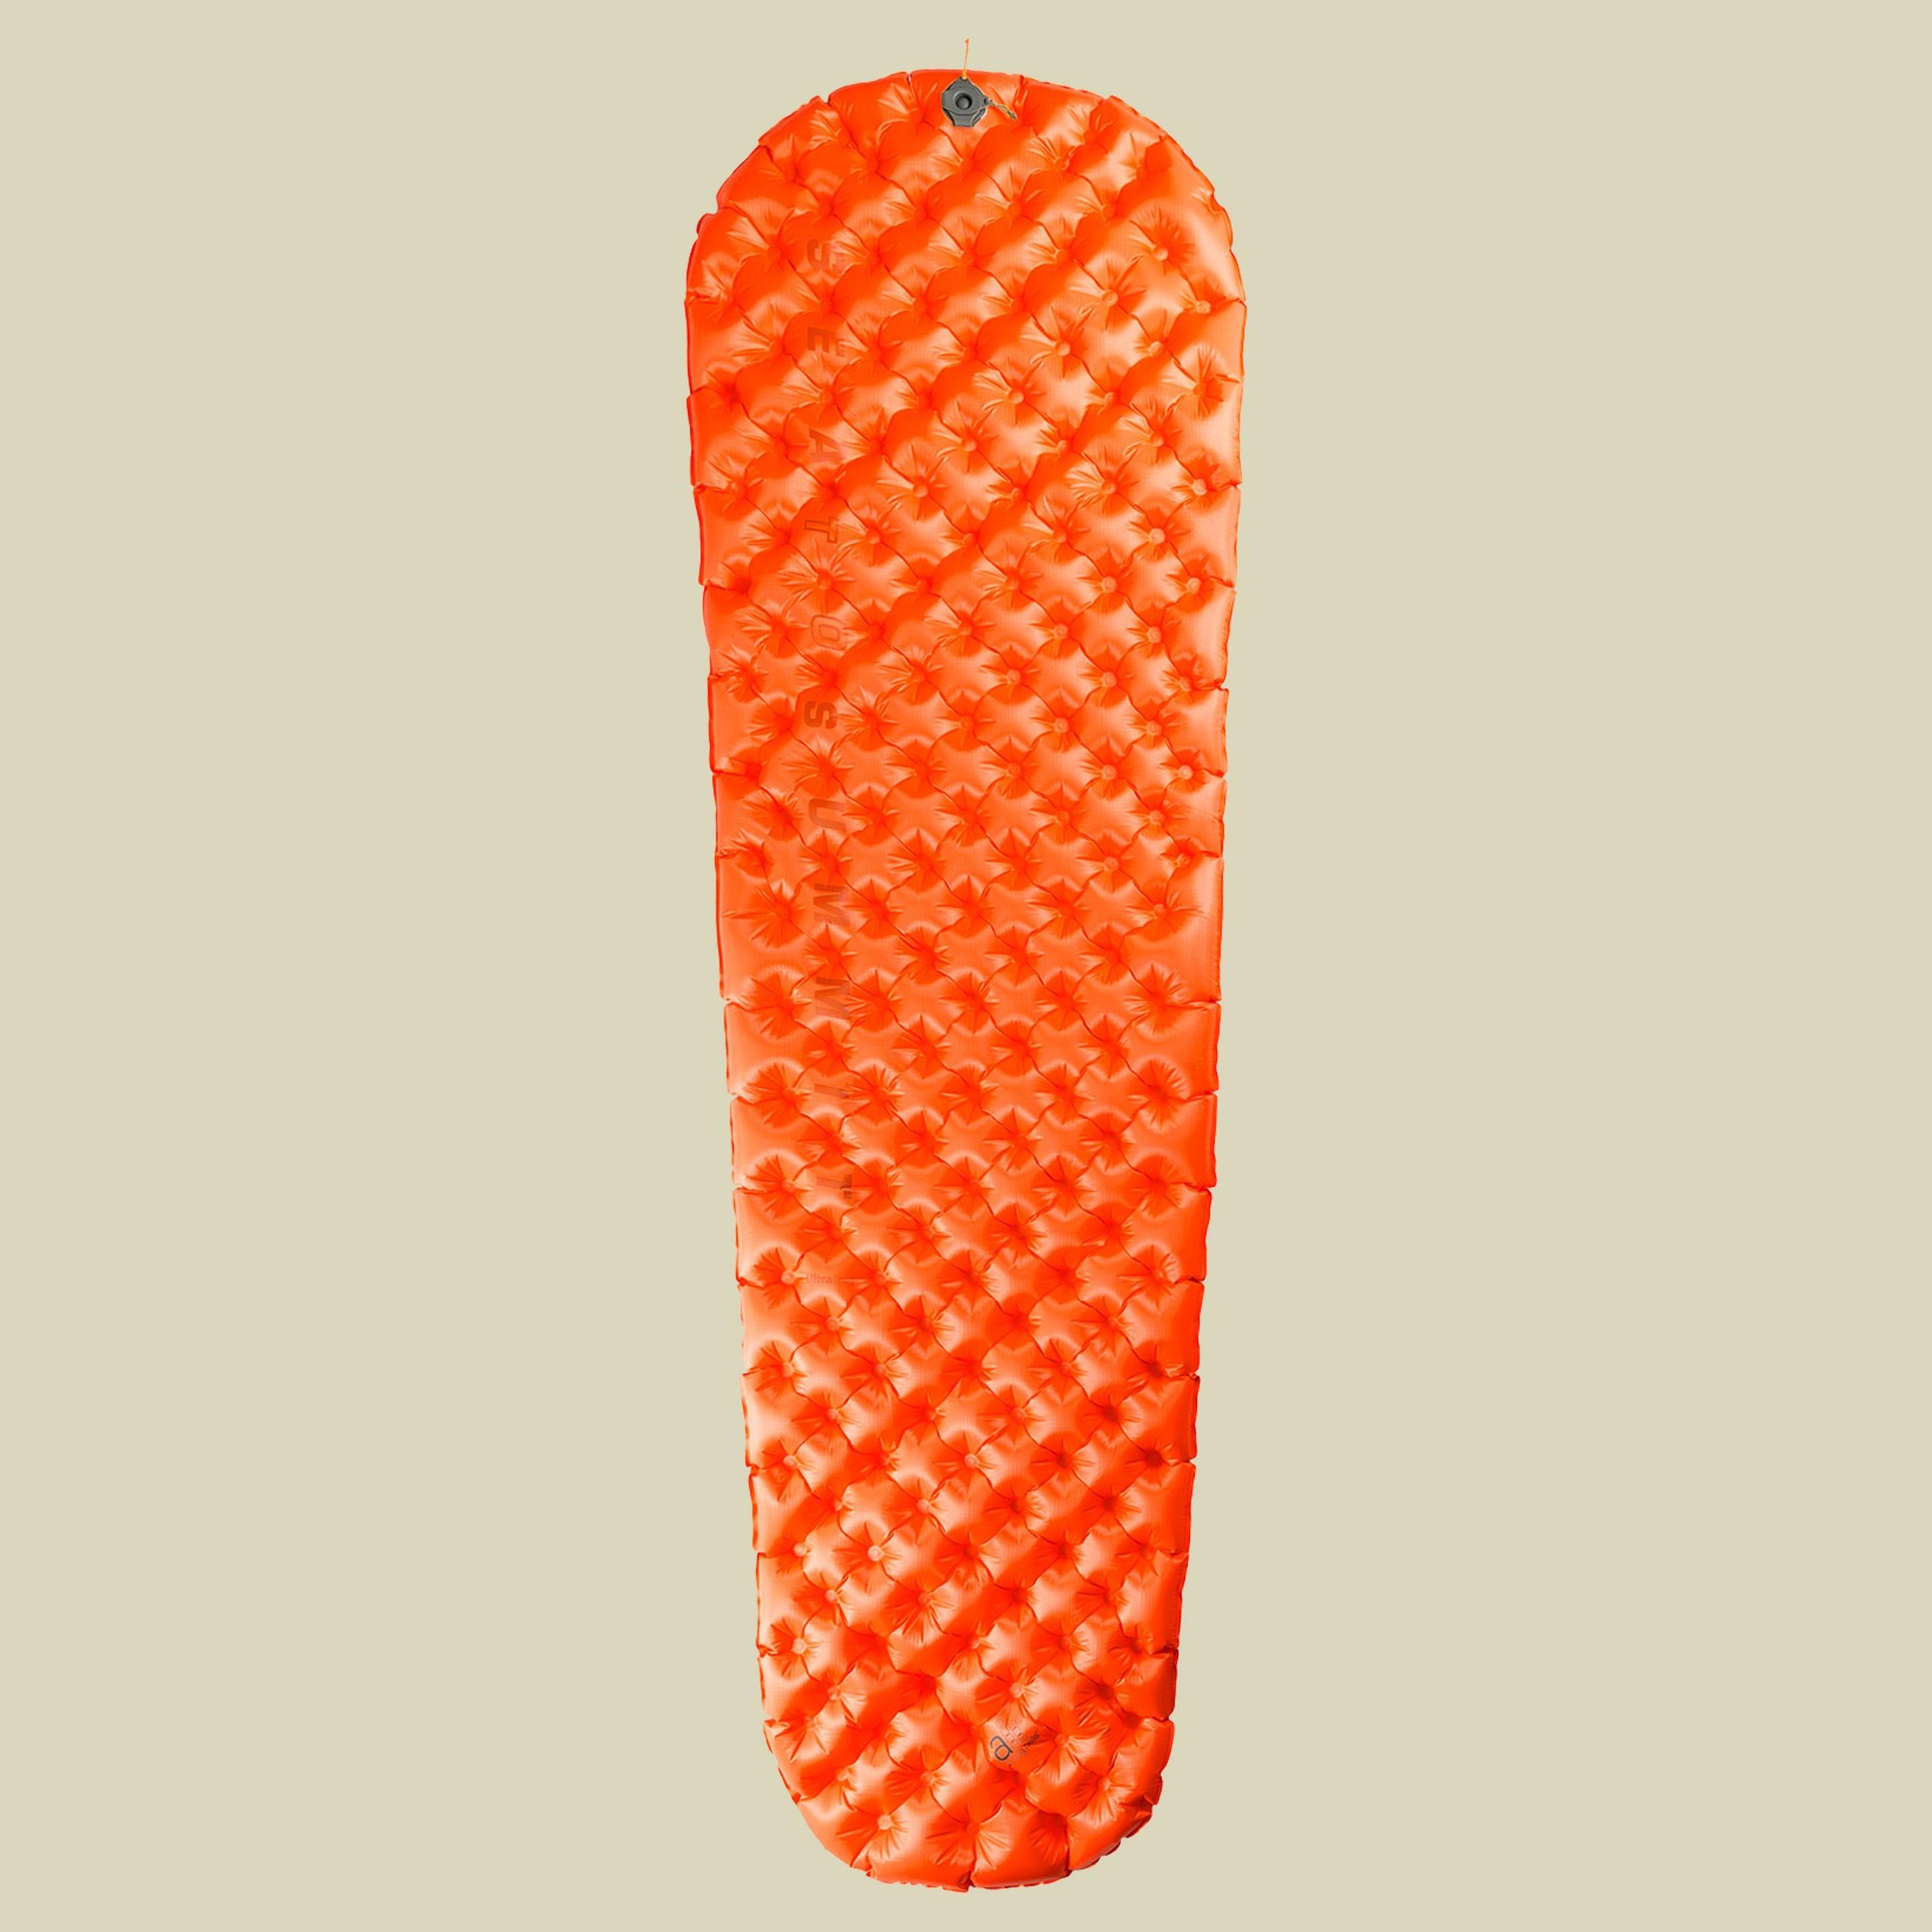 sea_to_summit_ultra_light_insulated_mat_regular_orange_fallback